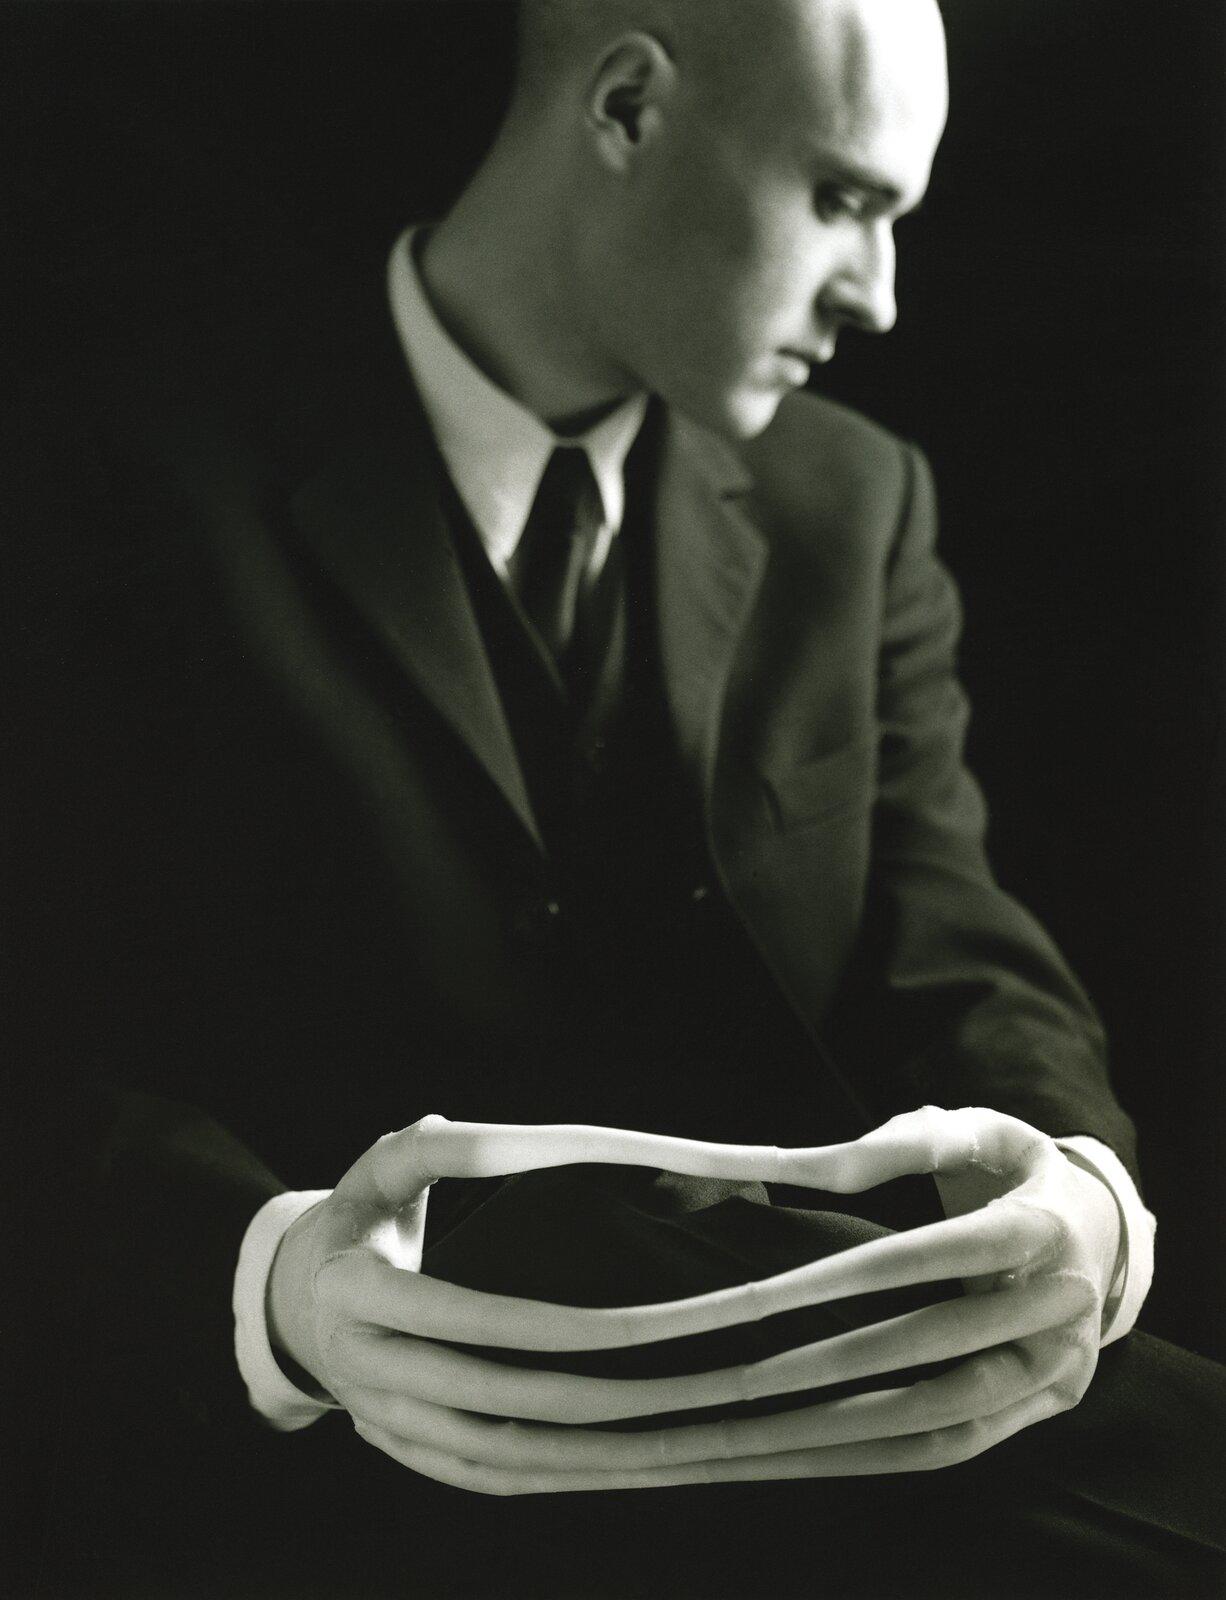 Autoportret Źródło: Javier Pérez, Autoportret, 1996, fotografia, licencja: CC BY-SA 3.0.